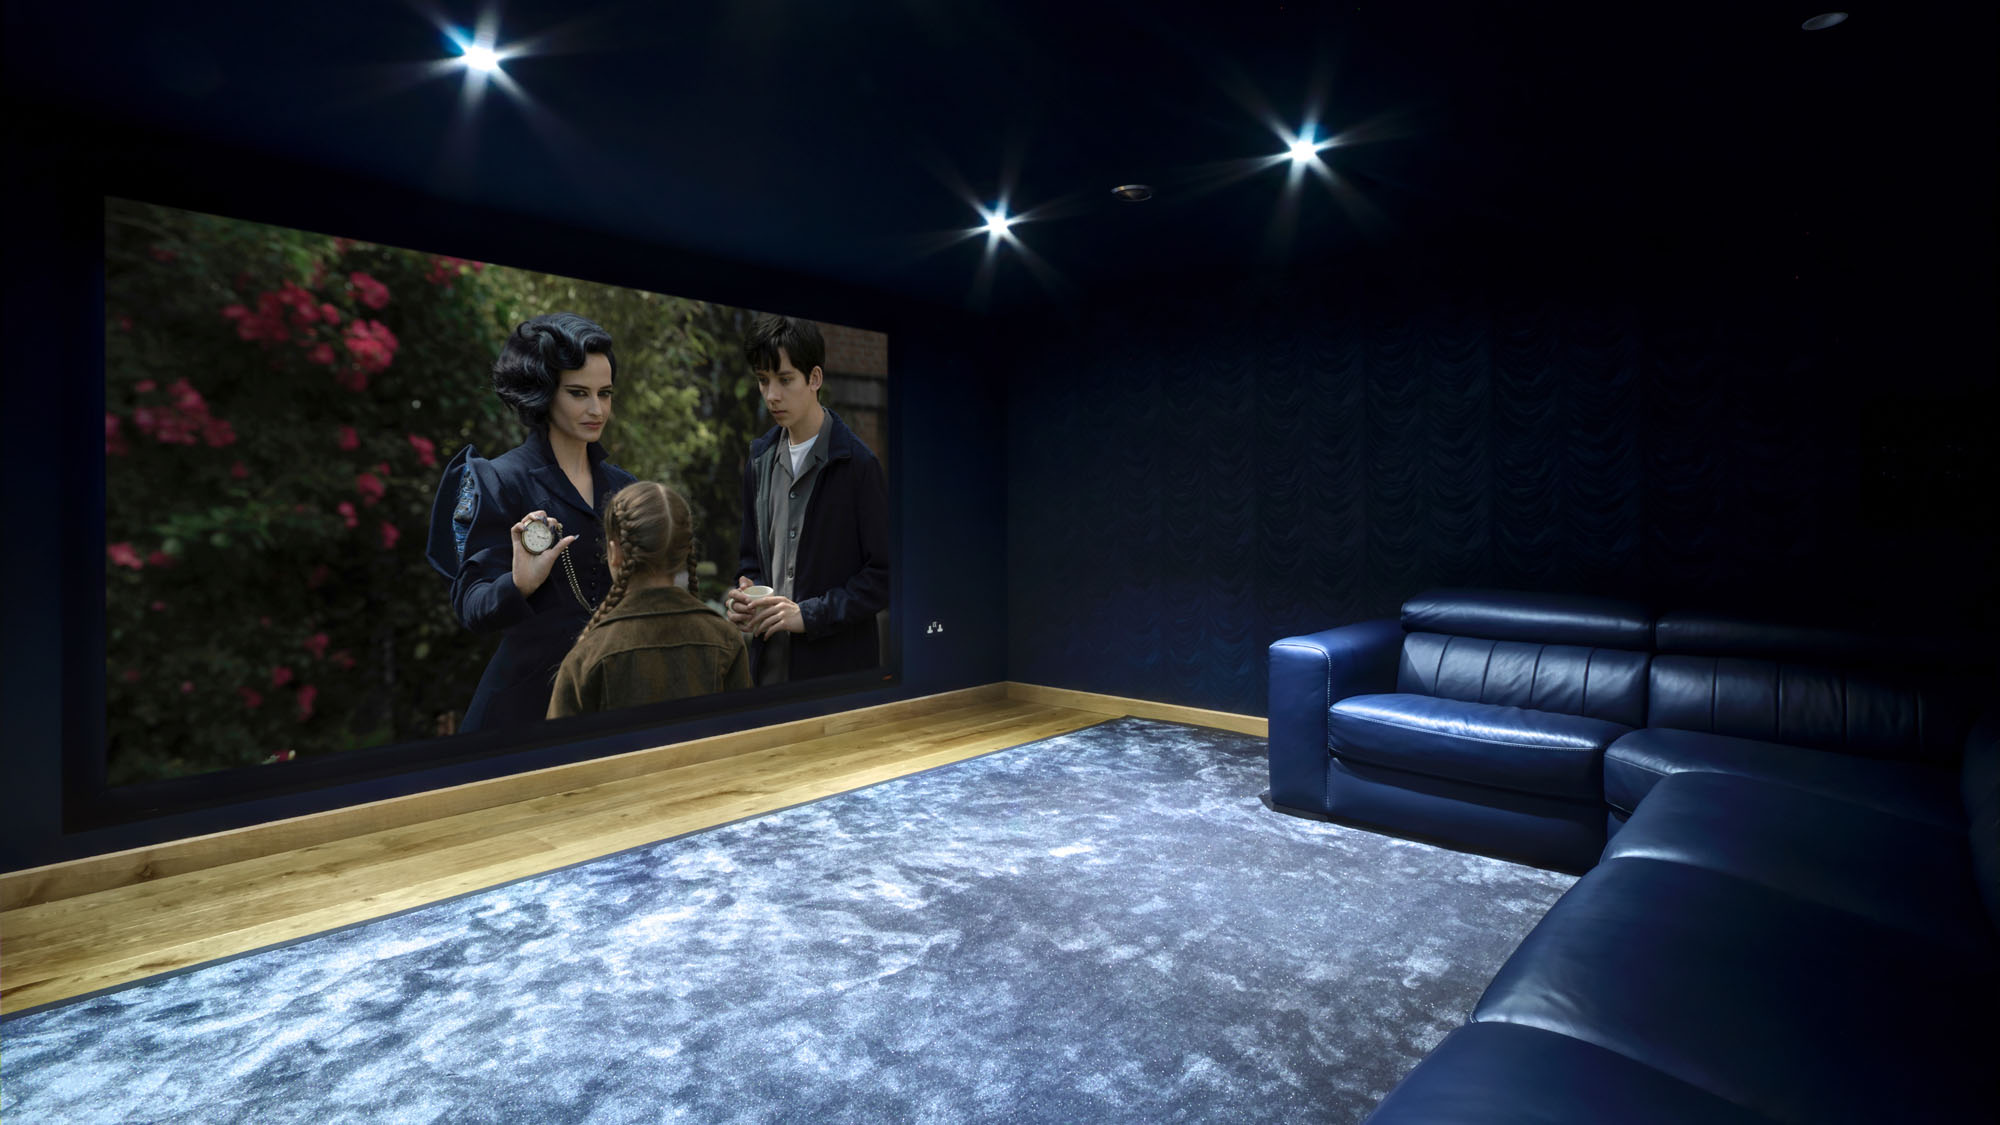 Artcoustic_Home_Cinema_Modus_Vivendi-6.jpg